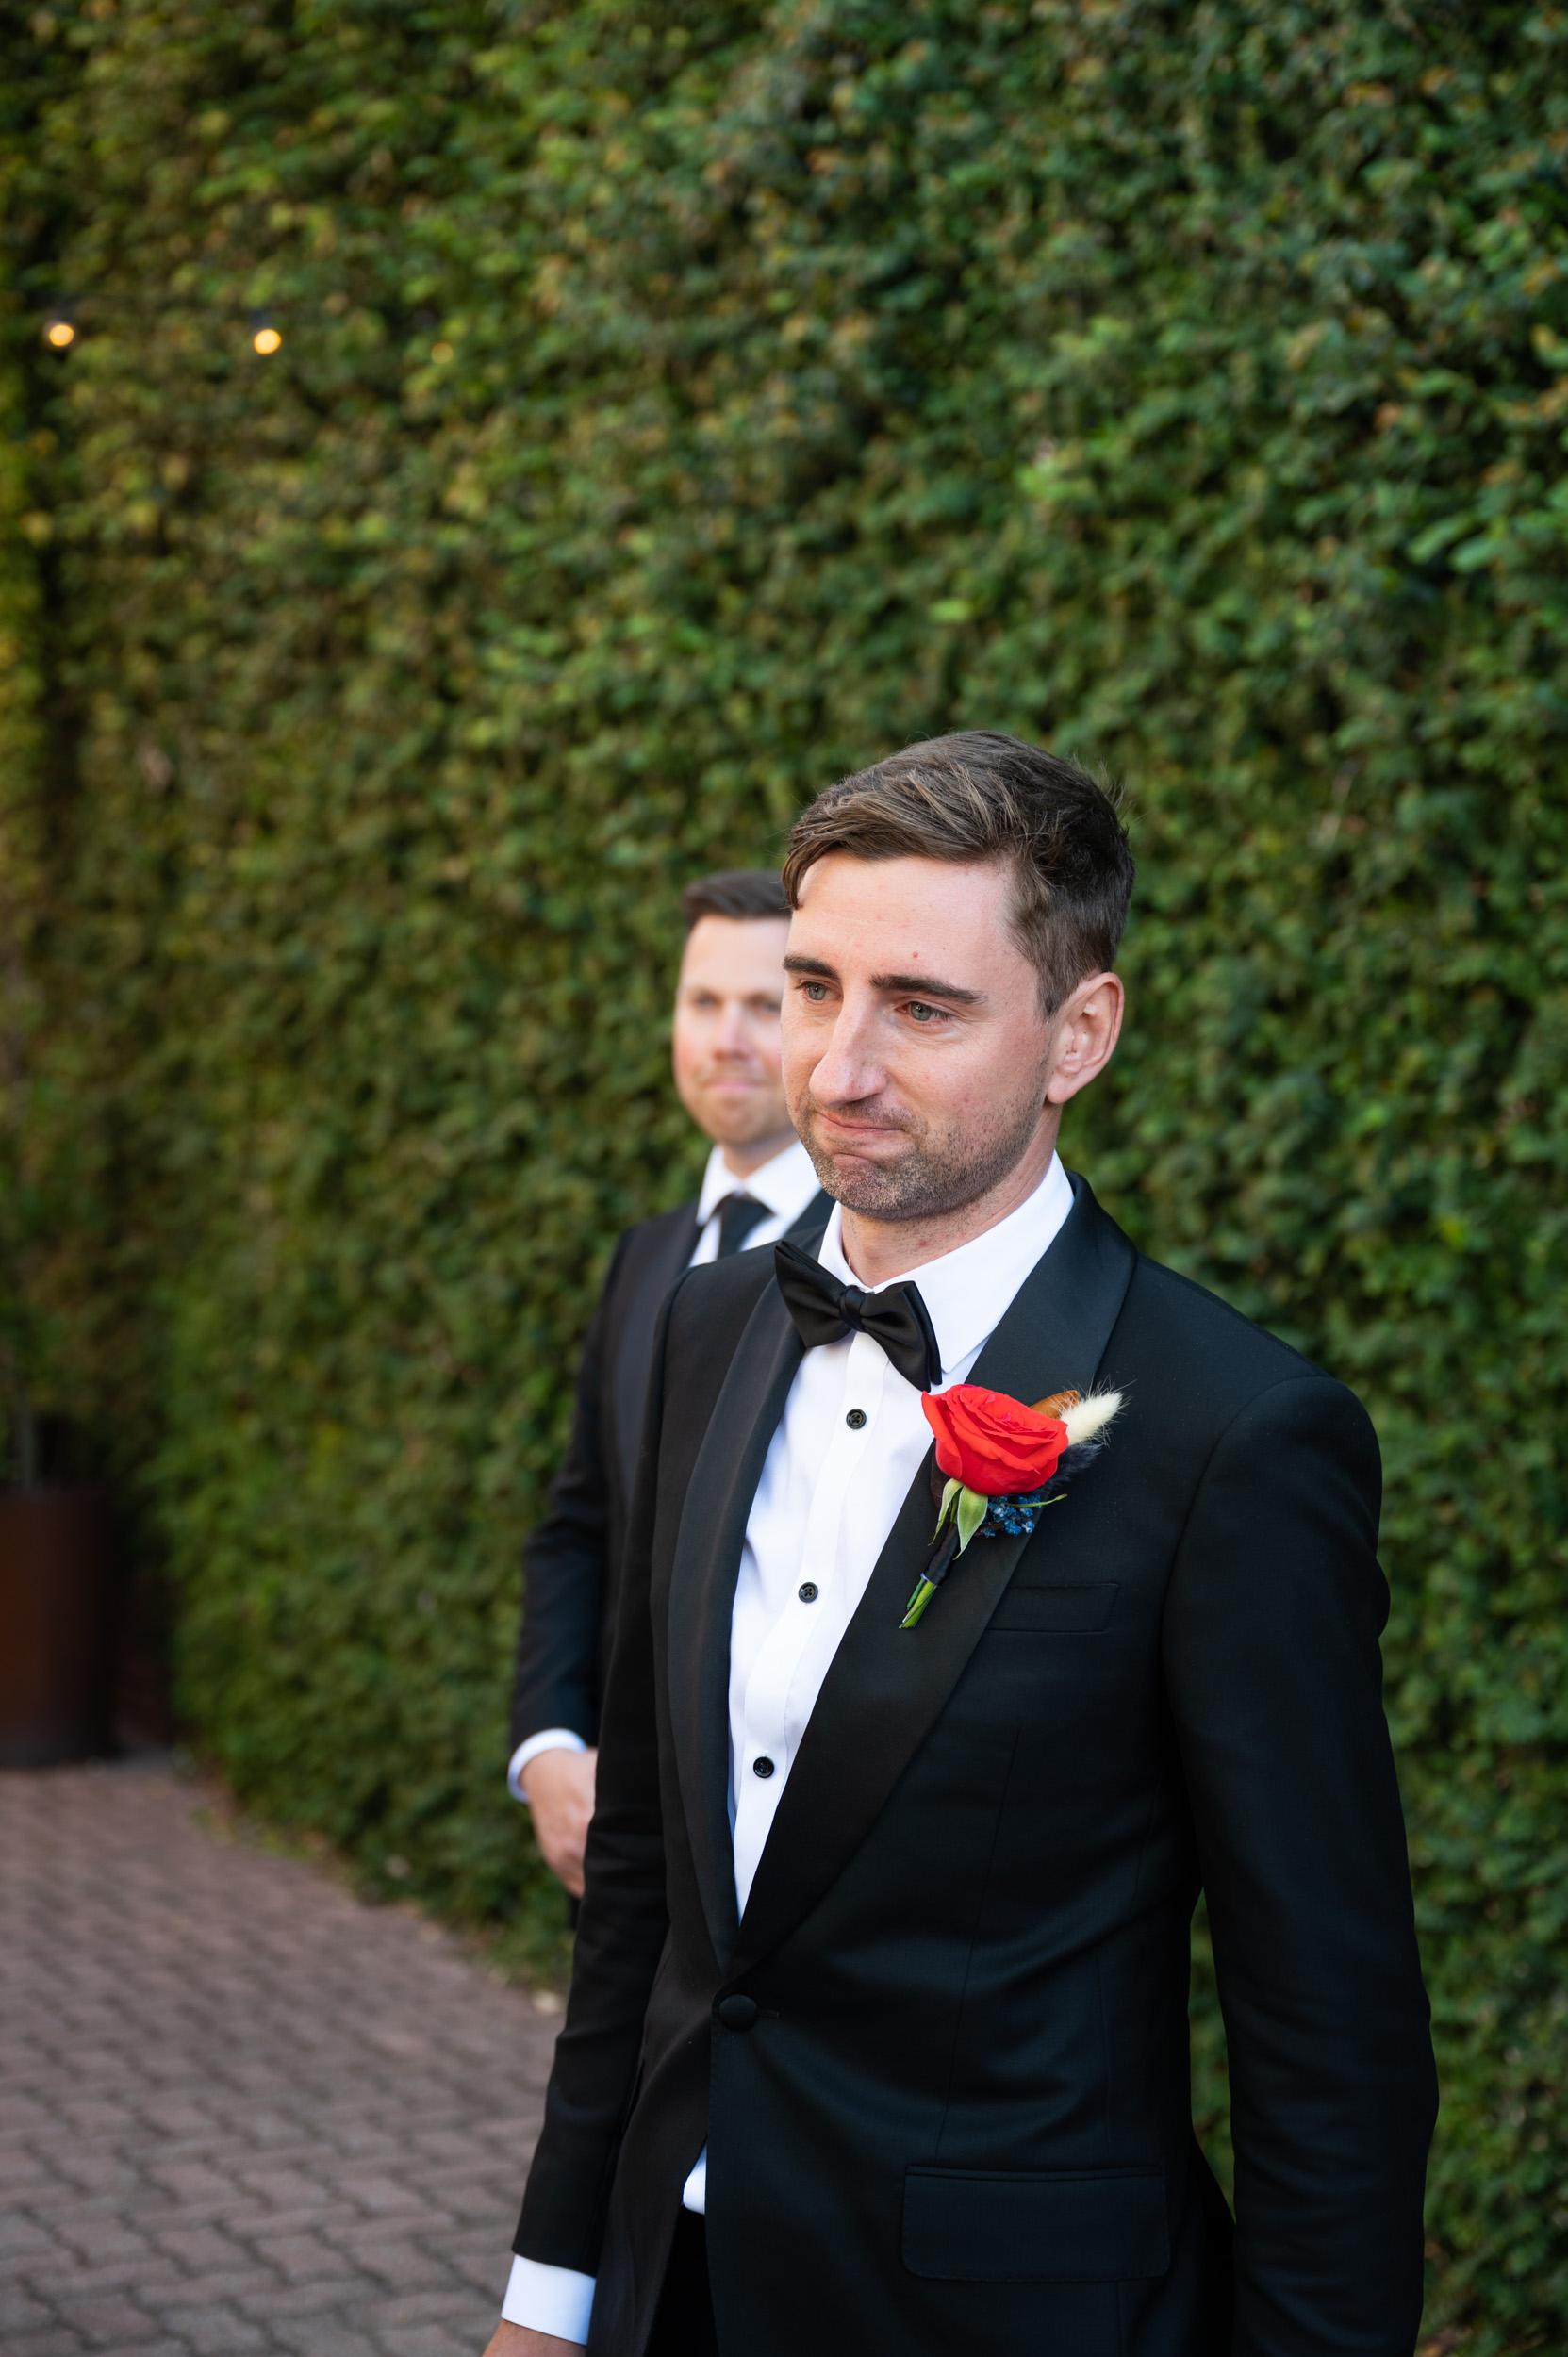 Groom, Emotion, Wedding Day, Wedding Ceremony